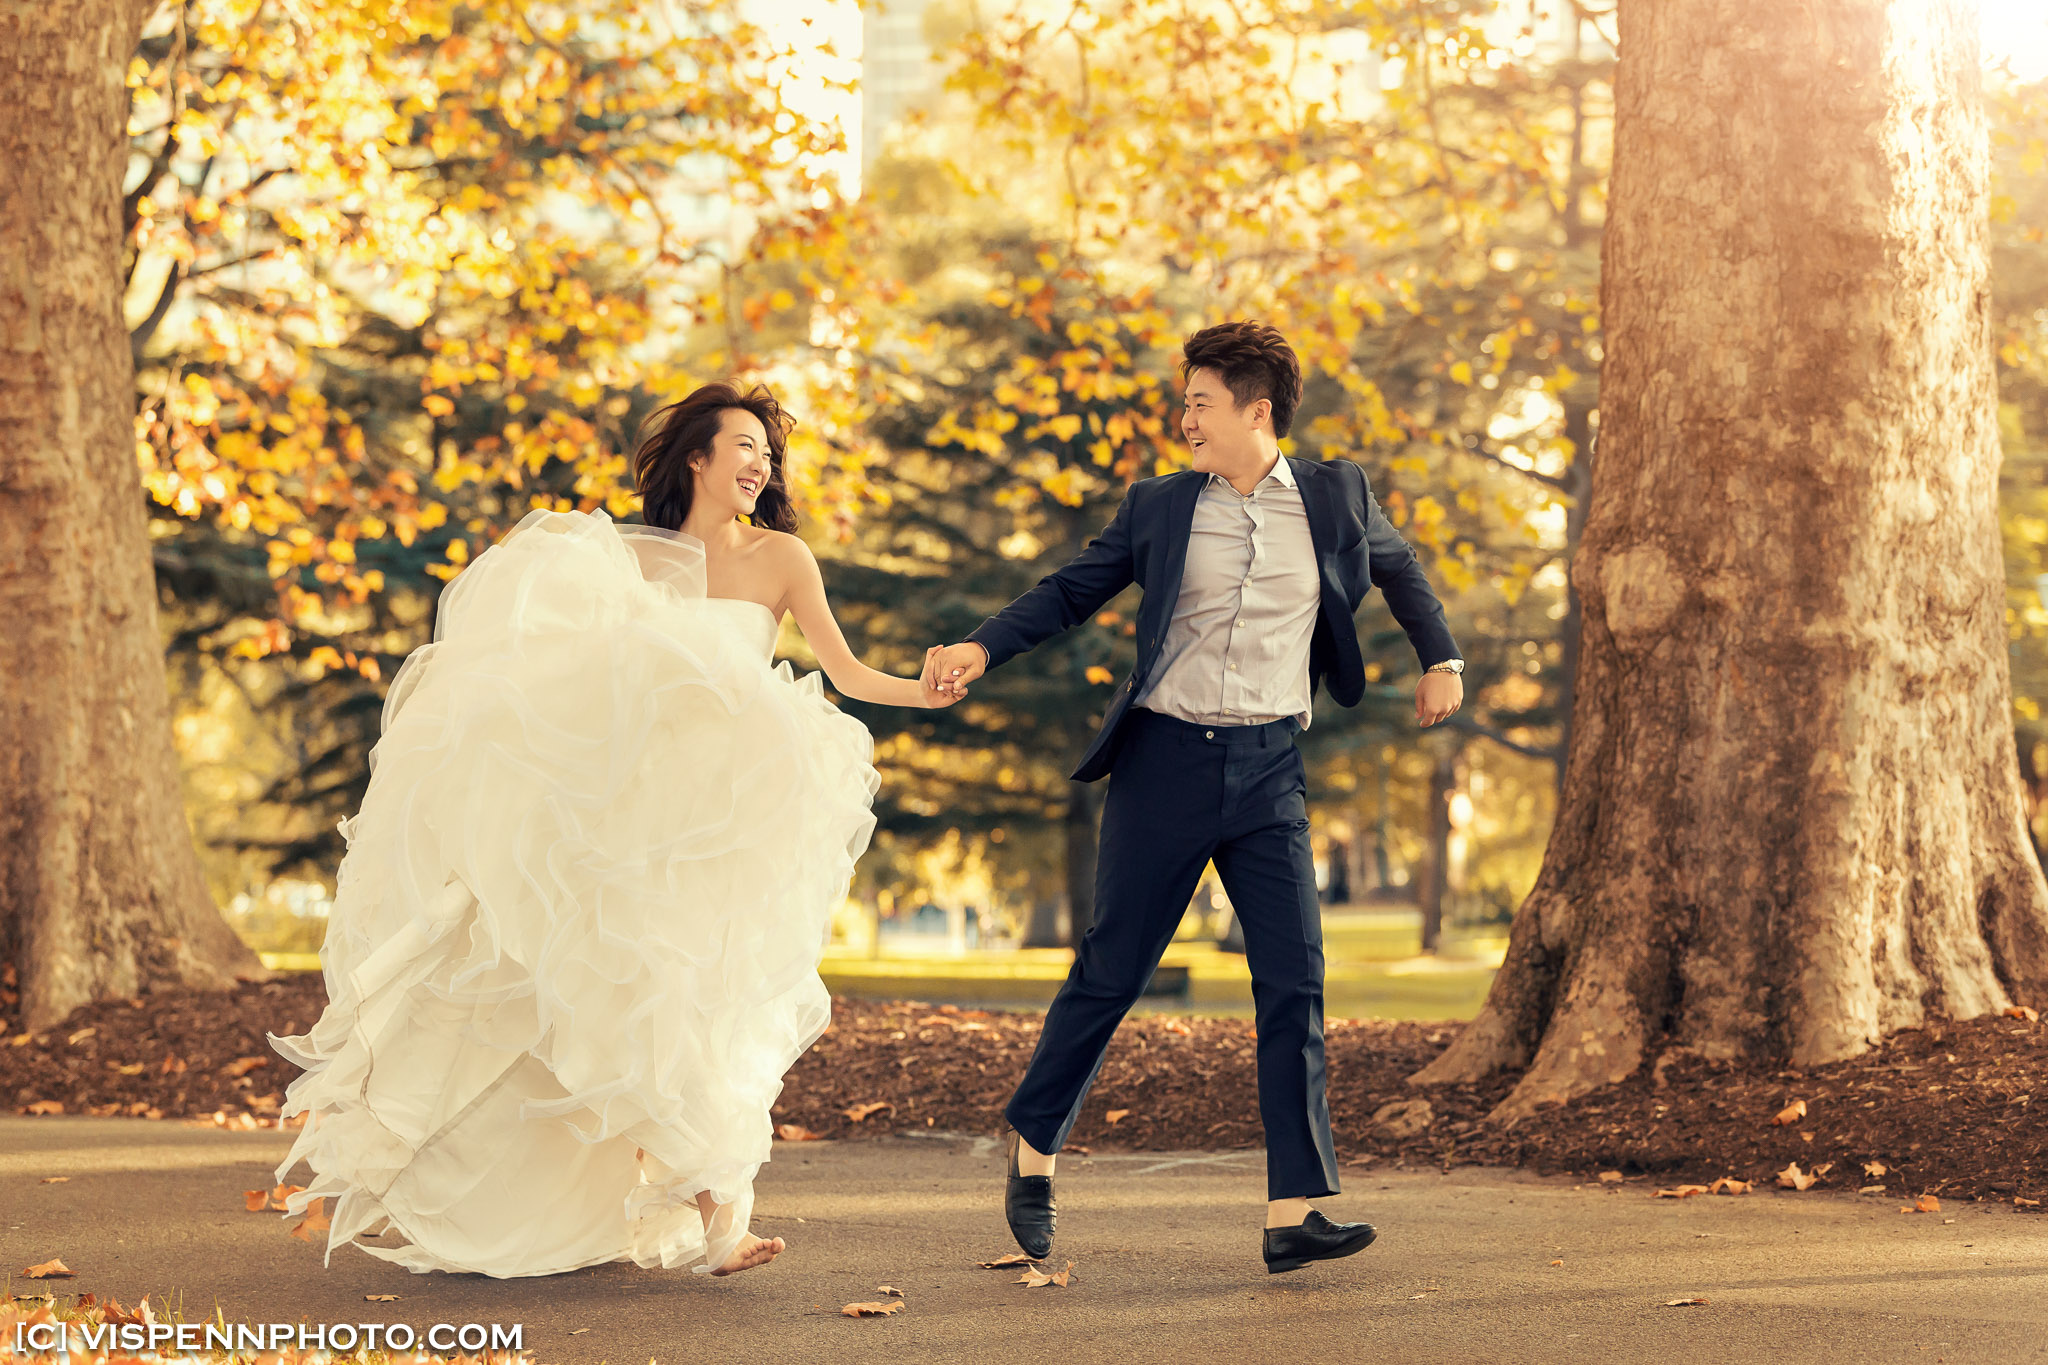 PRE WEDDING Photography Melbourne 5D1 3003